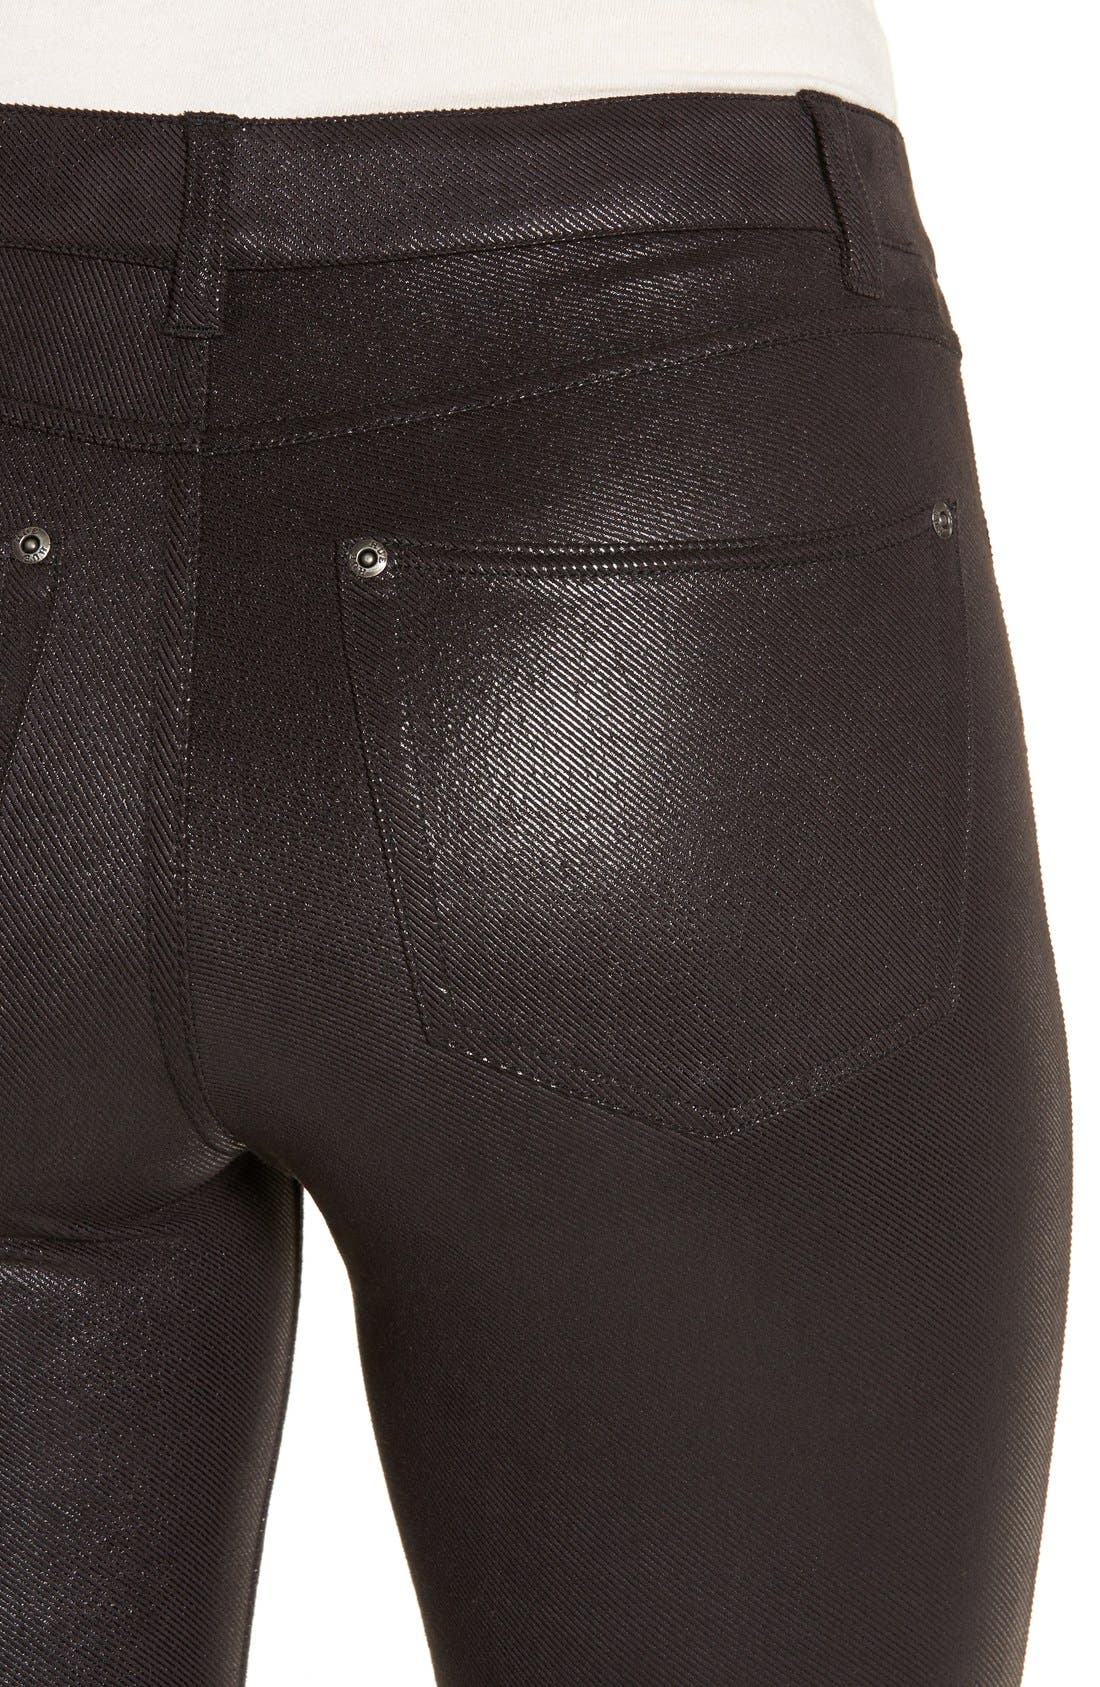 Alternate Image 4  - Hue 'Topcoat' Leggings